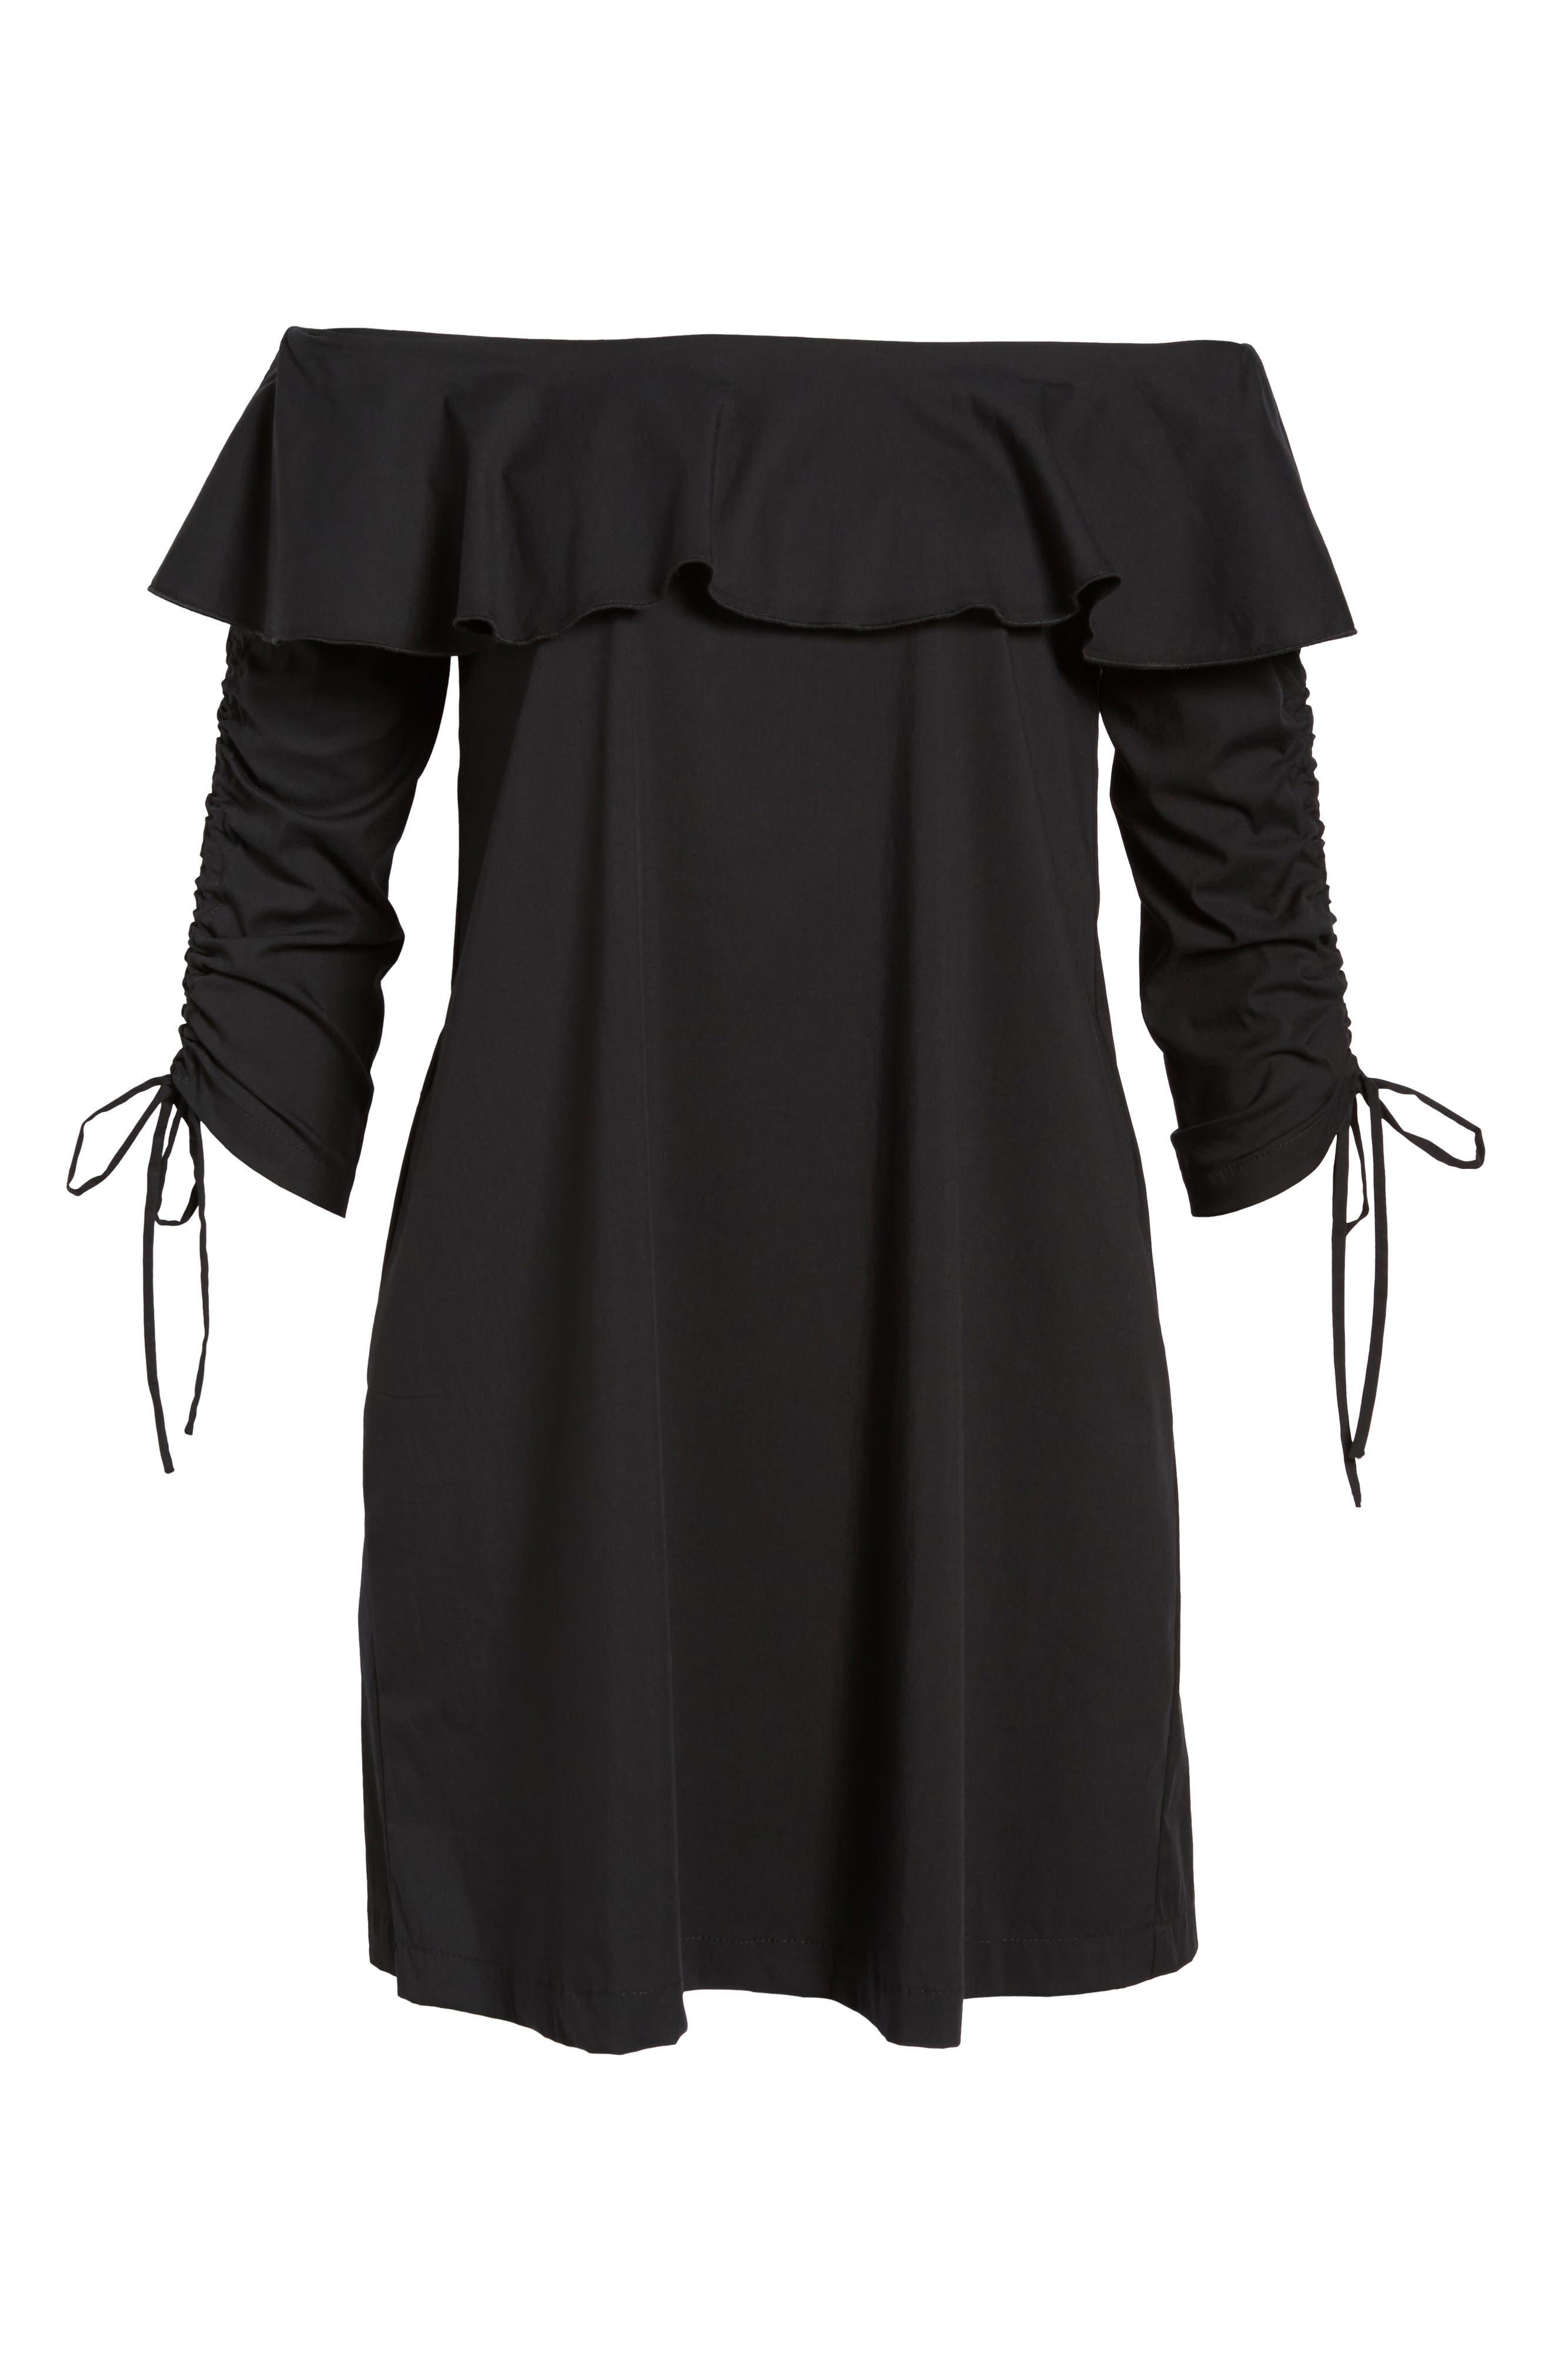 Cinch Sleeve Off the Shoulder Dress,                             Alternate thumbnail 6, color,                             001